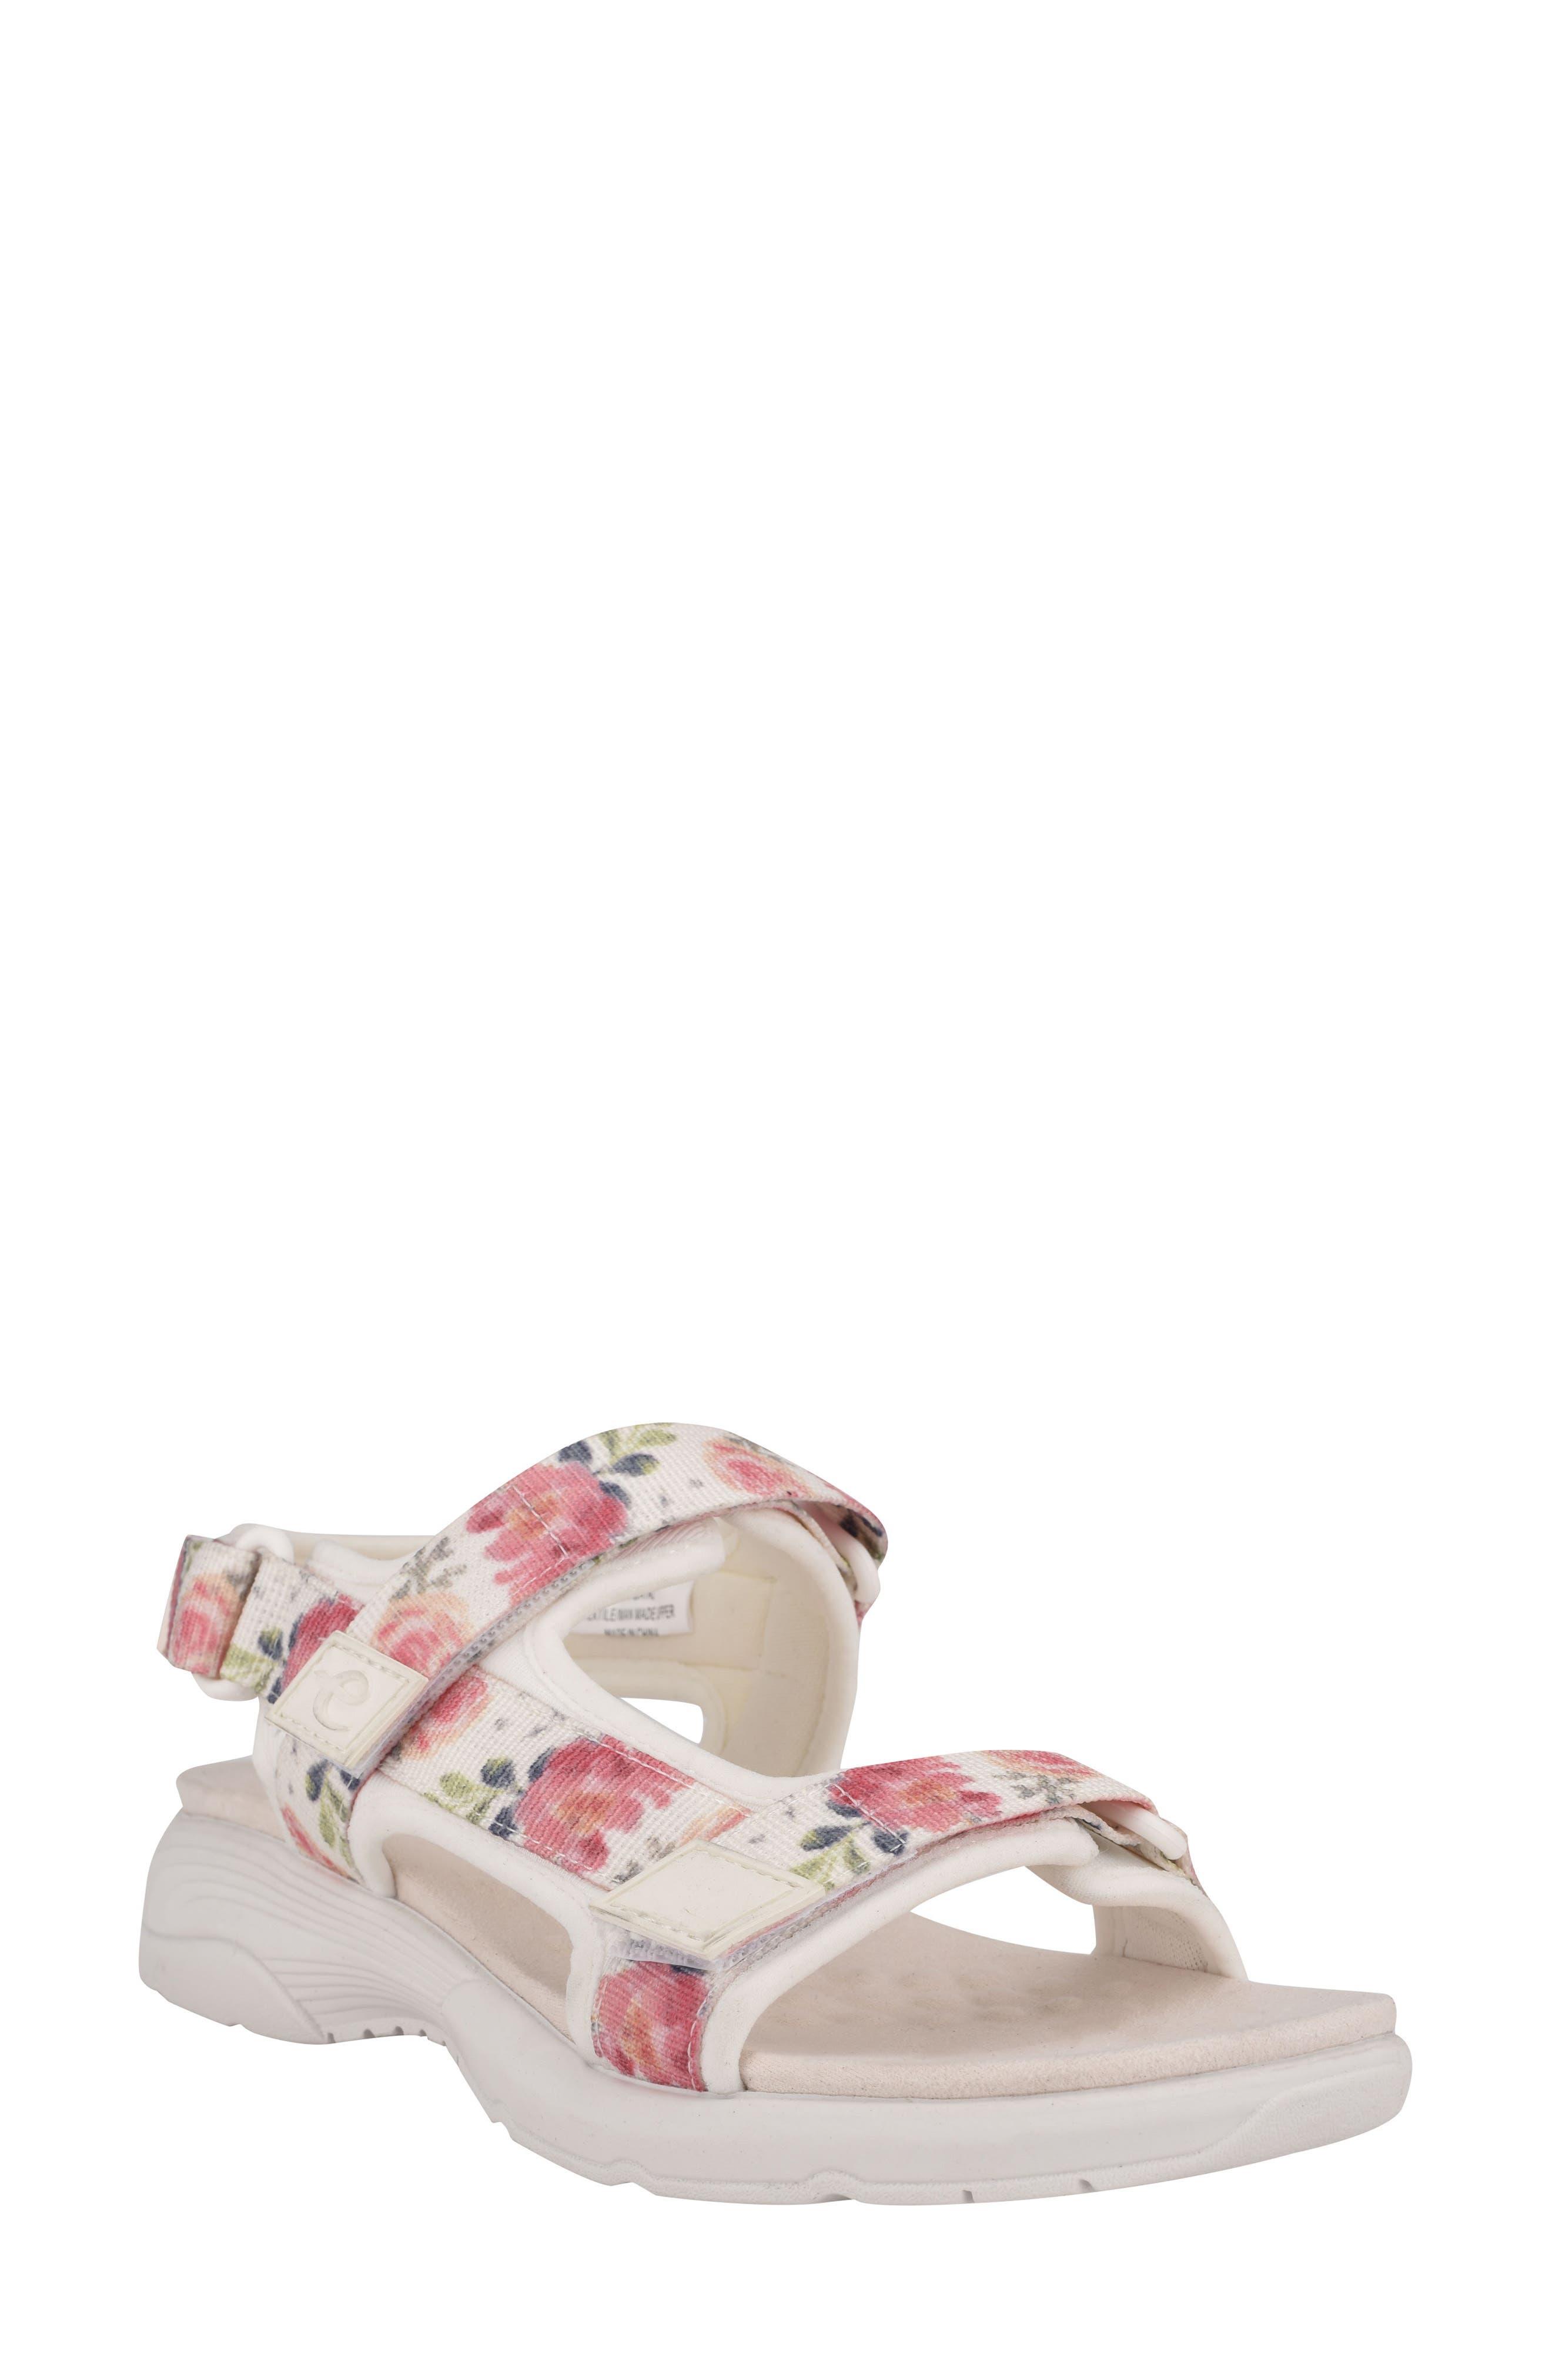 Tabata Sandal